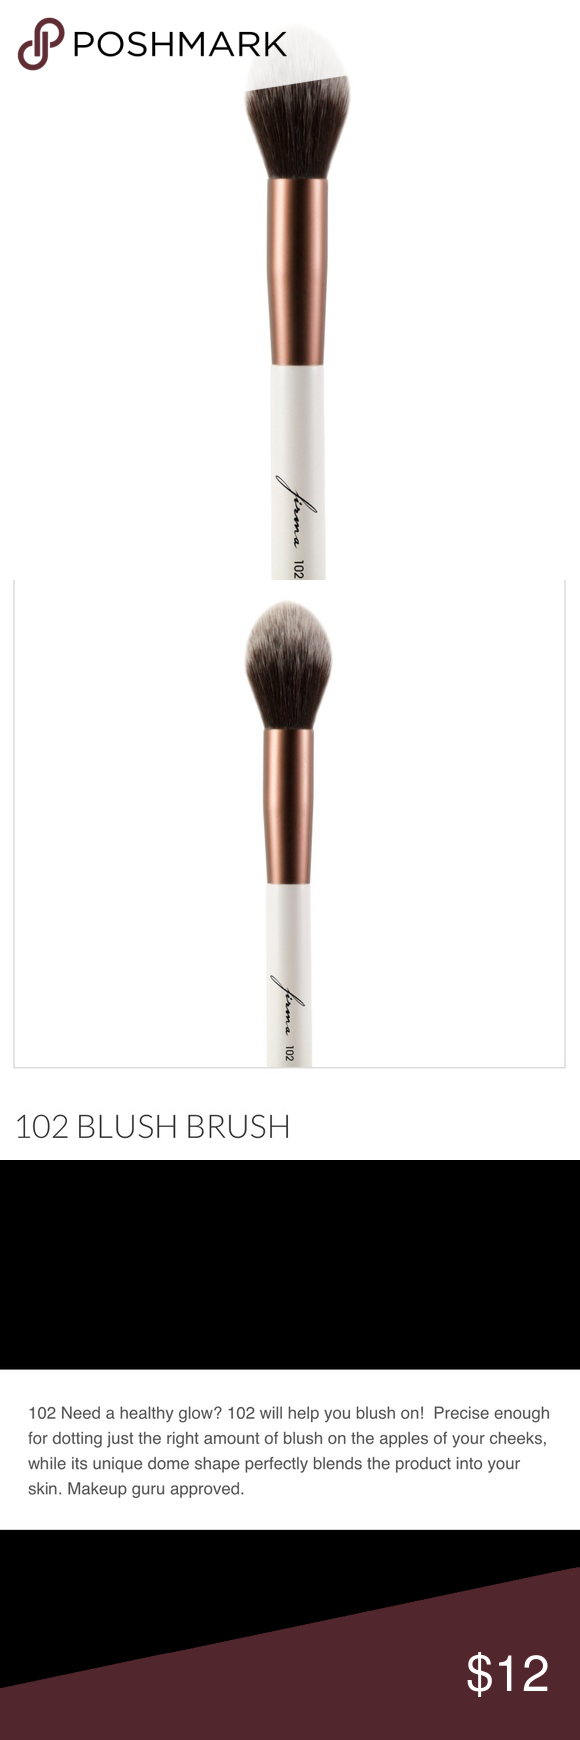 9432a1acf9c Firma 102 Blush Brush Need a healthy glow? The Firma Beauty 102 Elite Blush  Brush